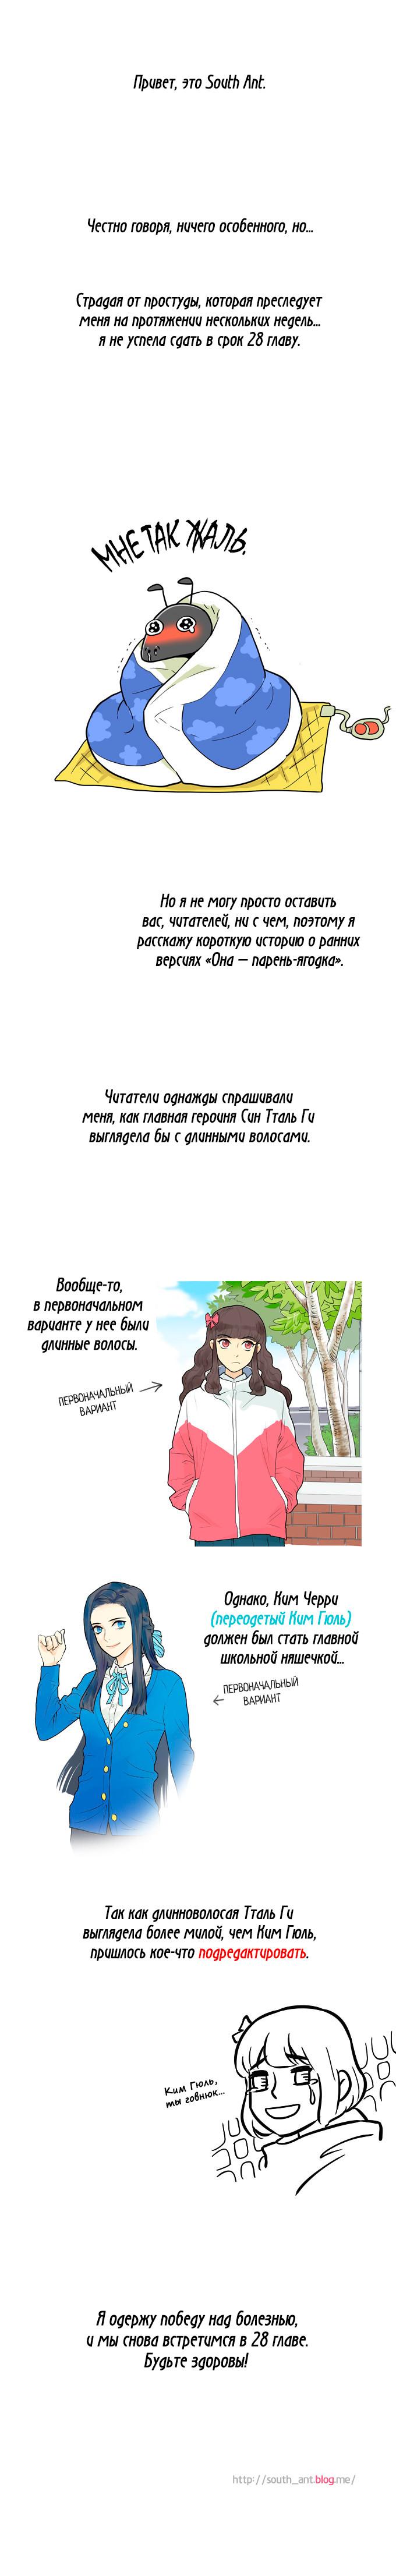 https://r1.ninemanga.com/comics/pic2/41/21609/214785/1428304746341.jpg Page 3